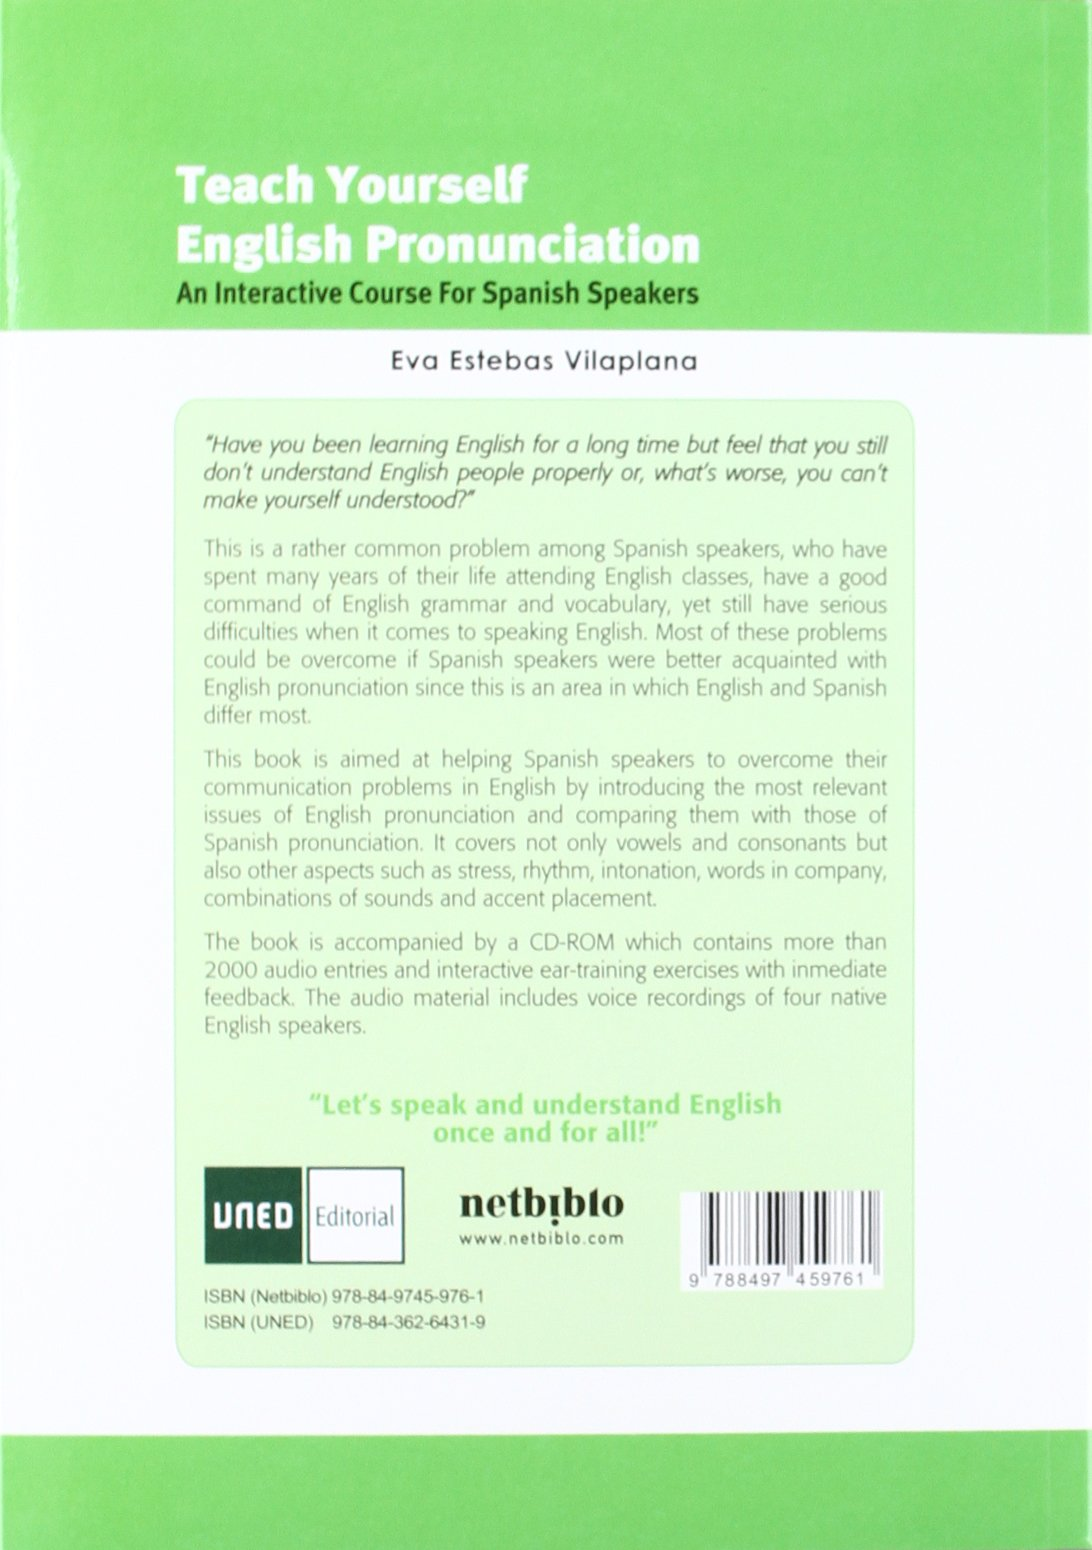 Teach Yourself English Pronunciation Cd 2ªed 9788497459761 Eva Estebas Vilaplana Books